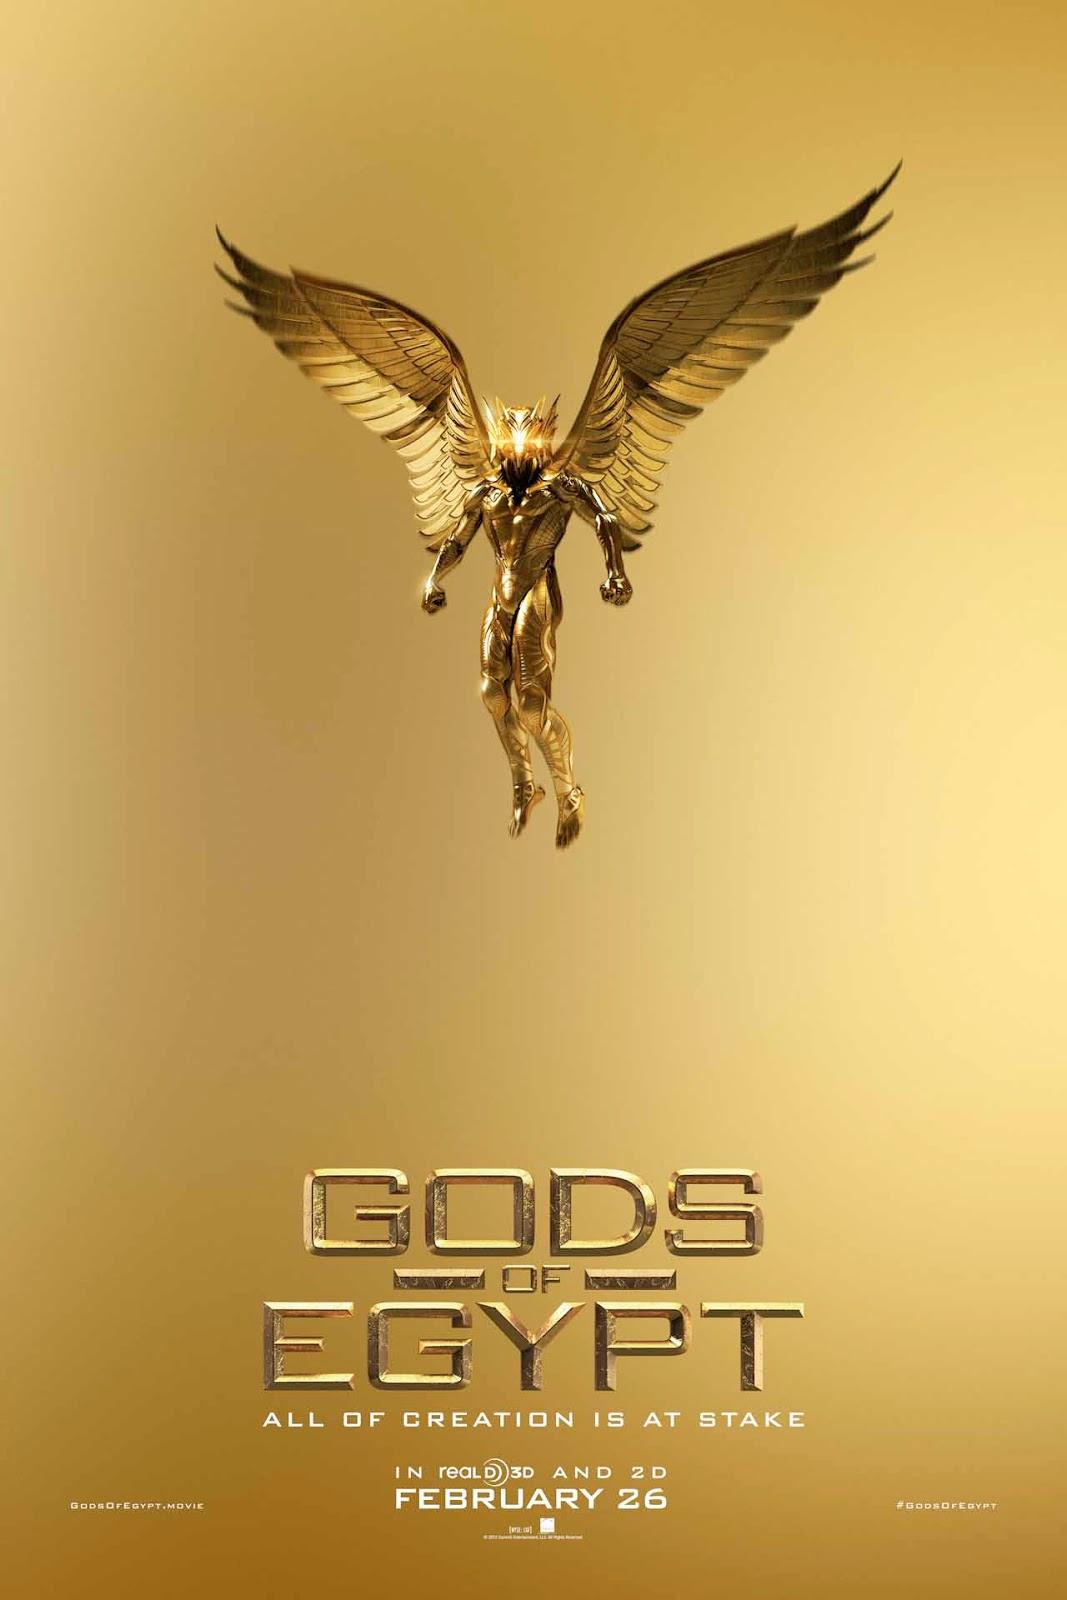 graig and david sometimes disagree: 3 Short Paragraphs: Gods of Egypt